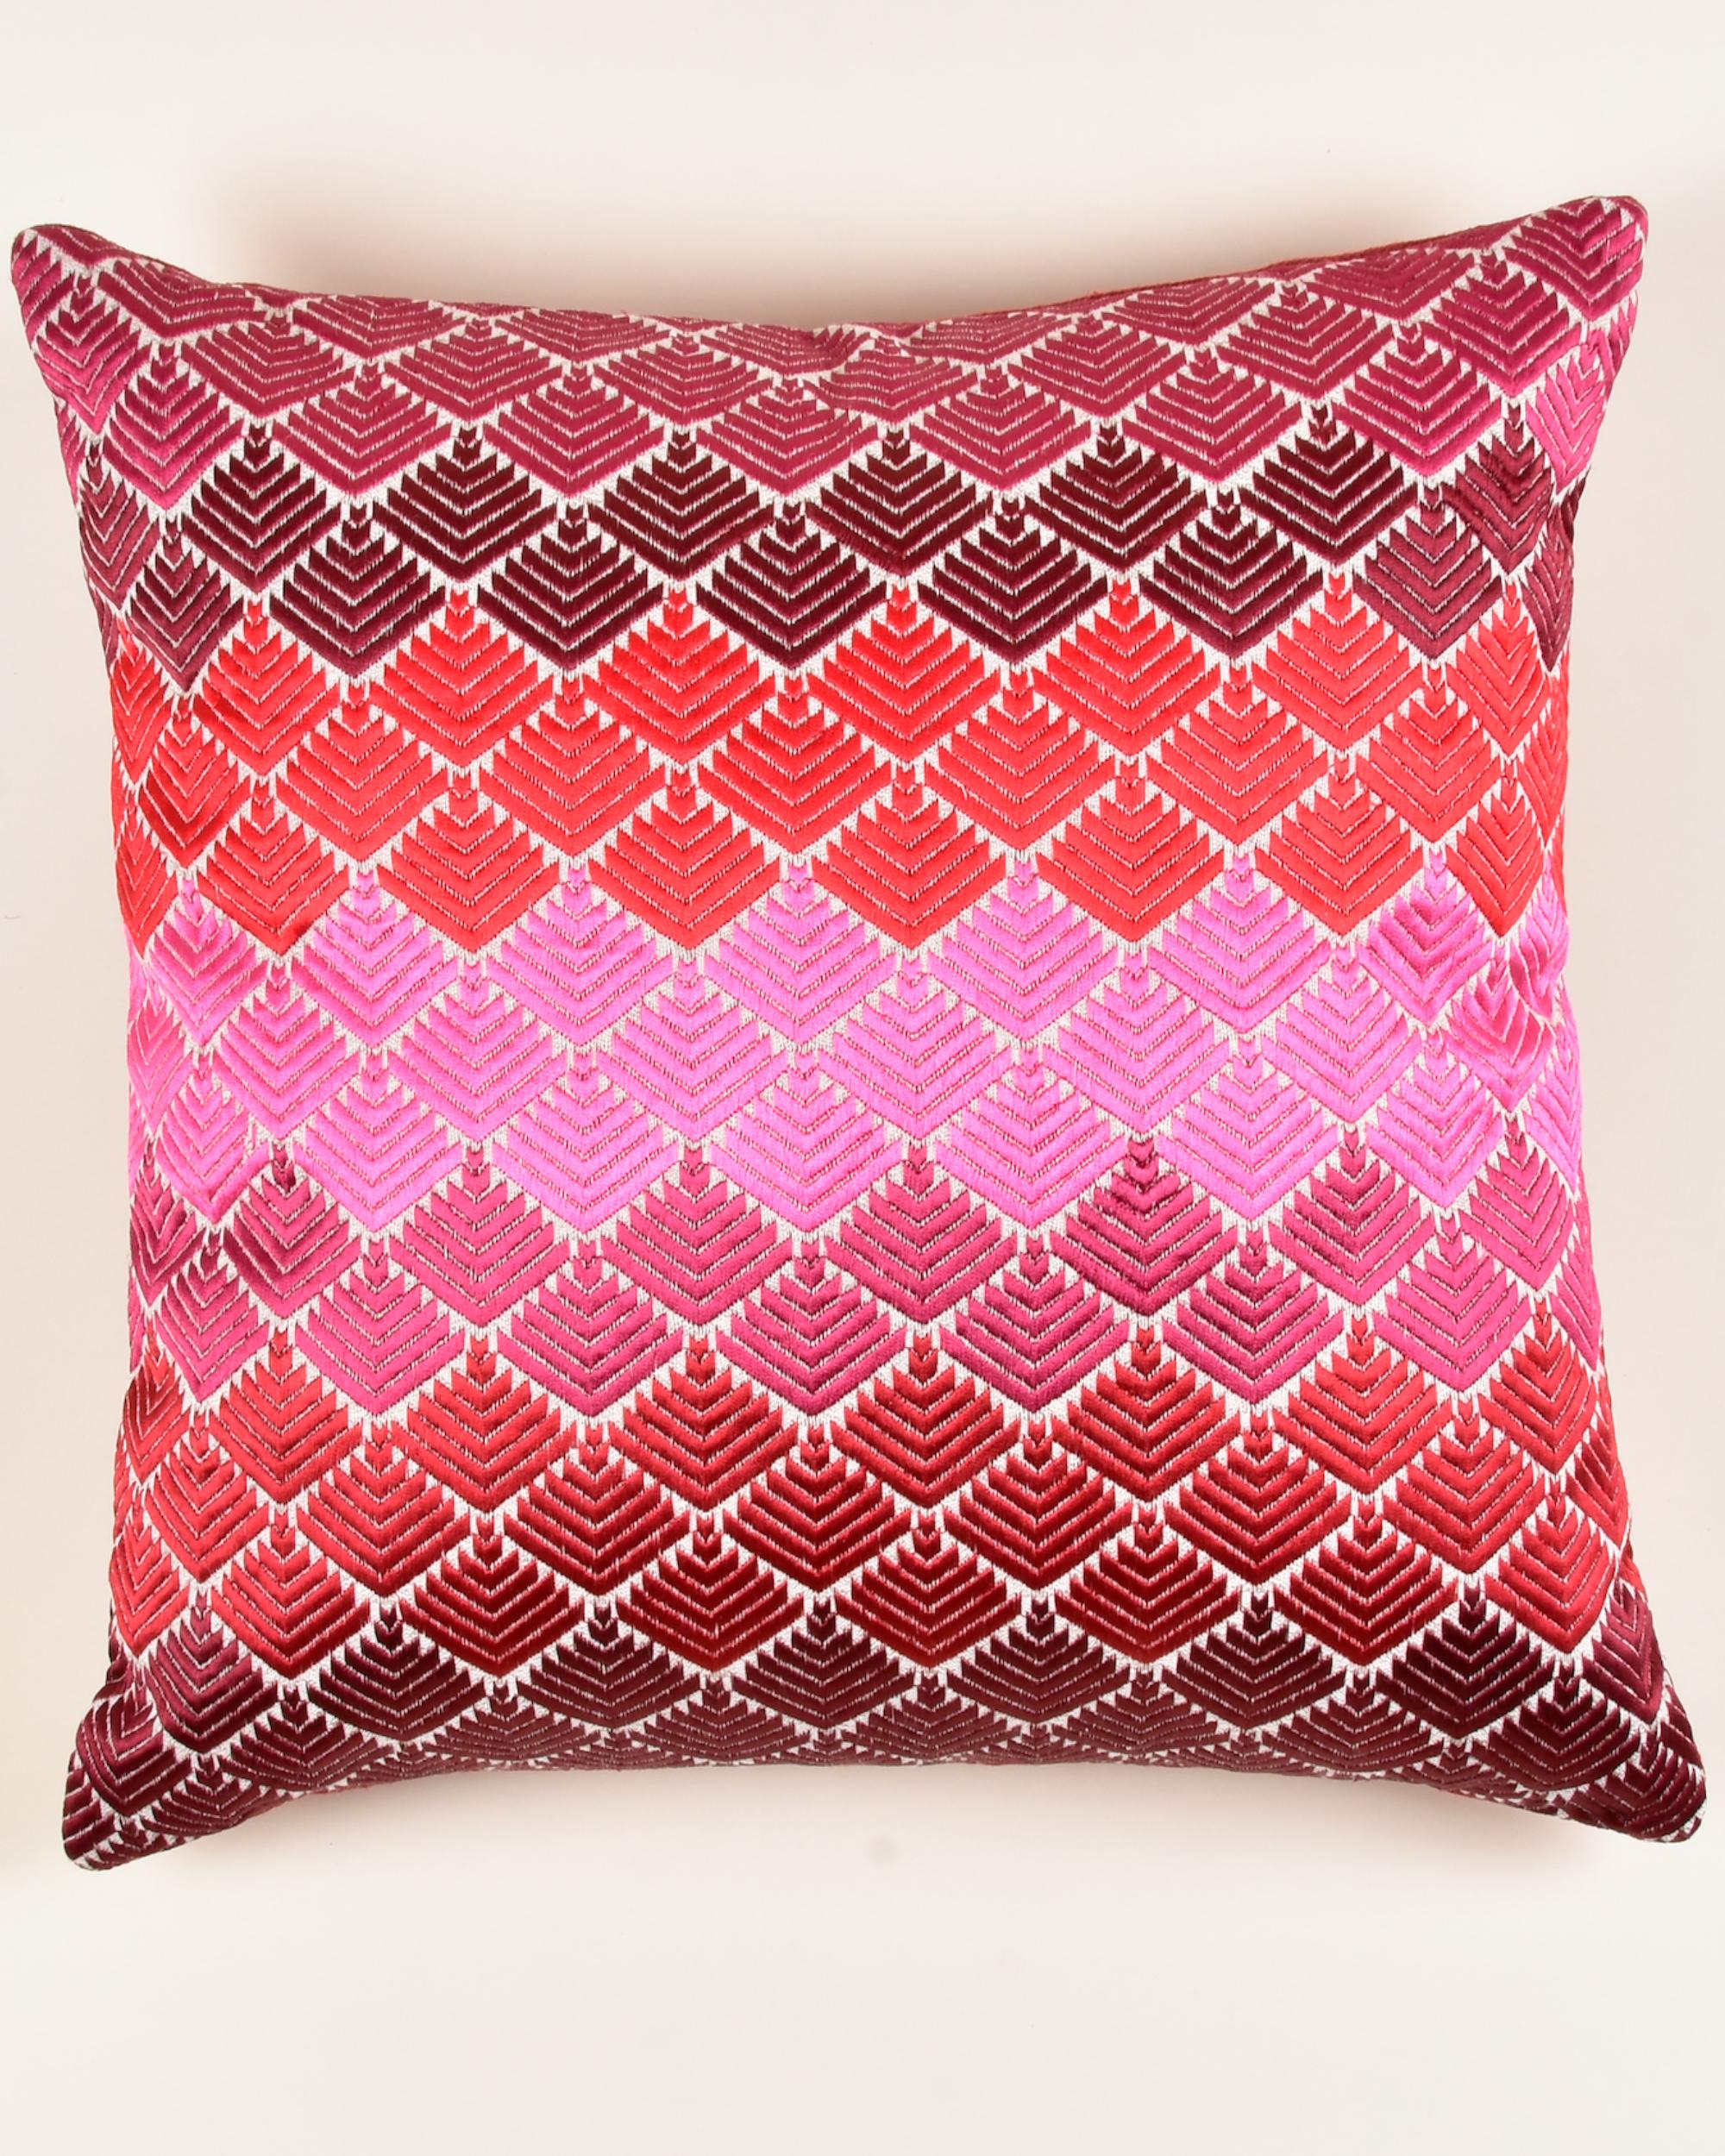 Faridkot phulkari cushion cover